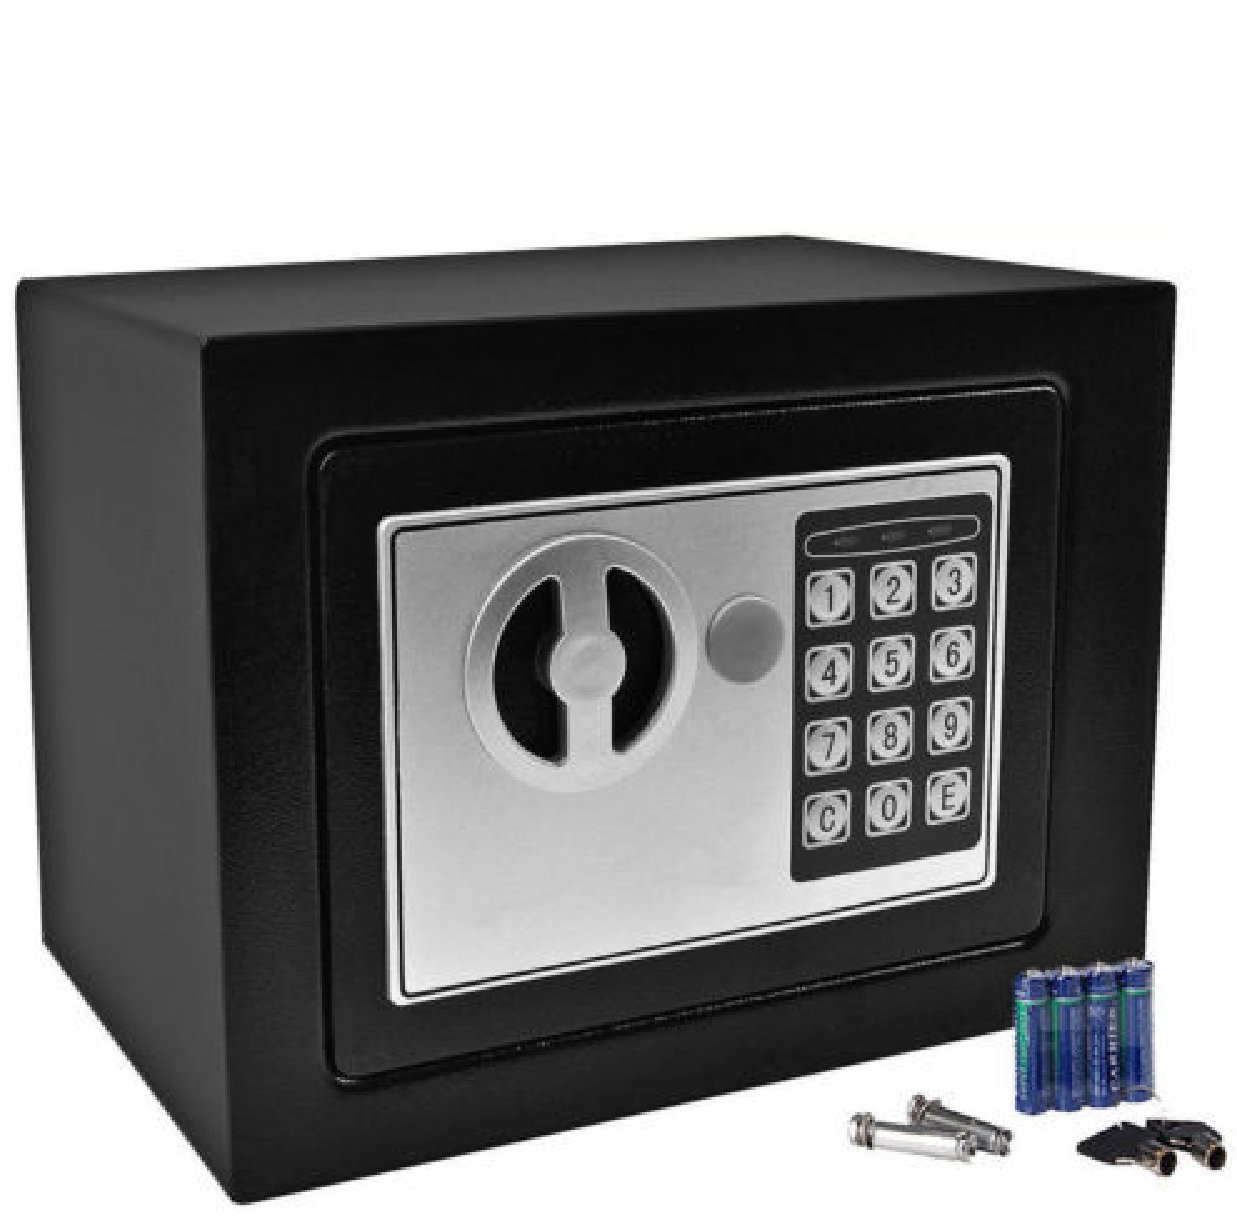 Durableキーパッドロックホームホテル:耐久性デジタル電子セーフボックスキーパッドロックセーフボックスホームオフィスホテルガンブラック: Office電子 B01FG7G7GW